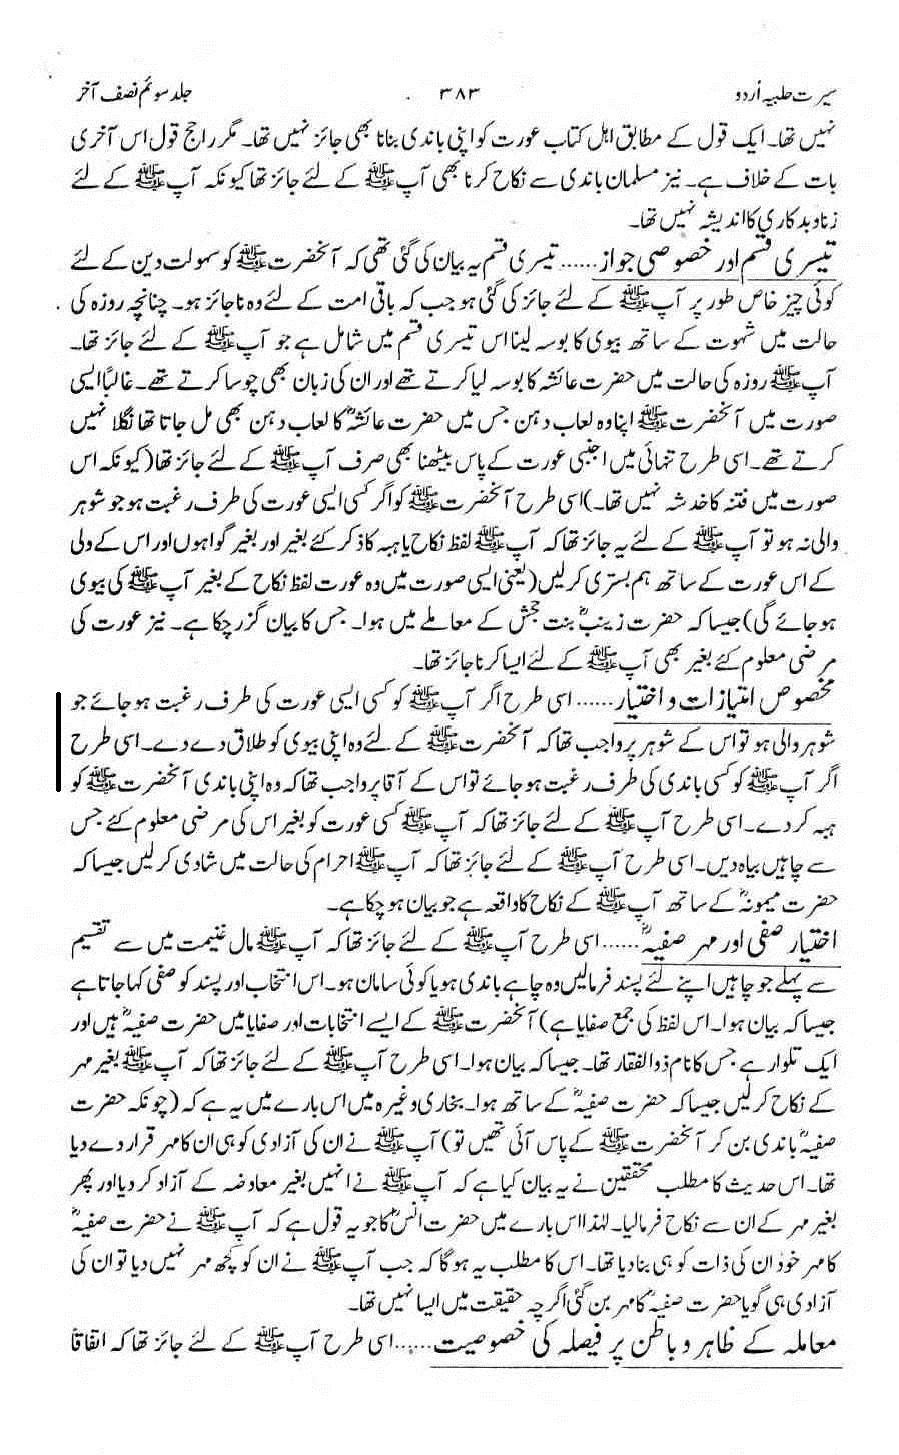 Seerat-e-Halbiya-Volume6-UrduTranslationByShaykhMuhammadAslamQasmi_0382.jpg